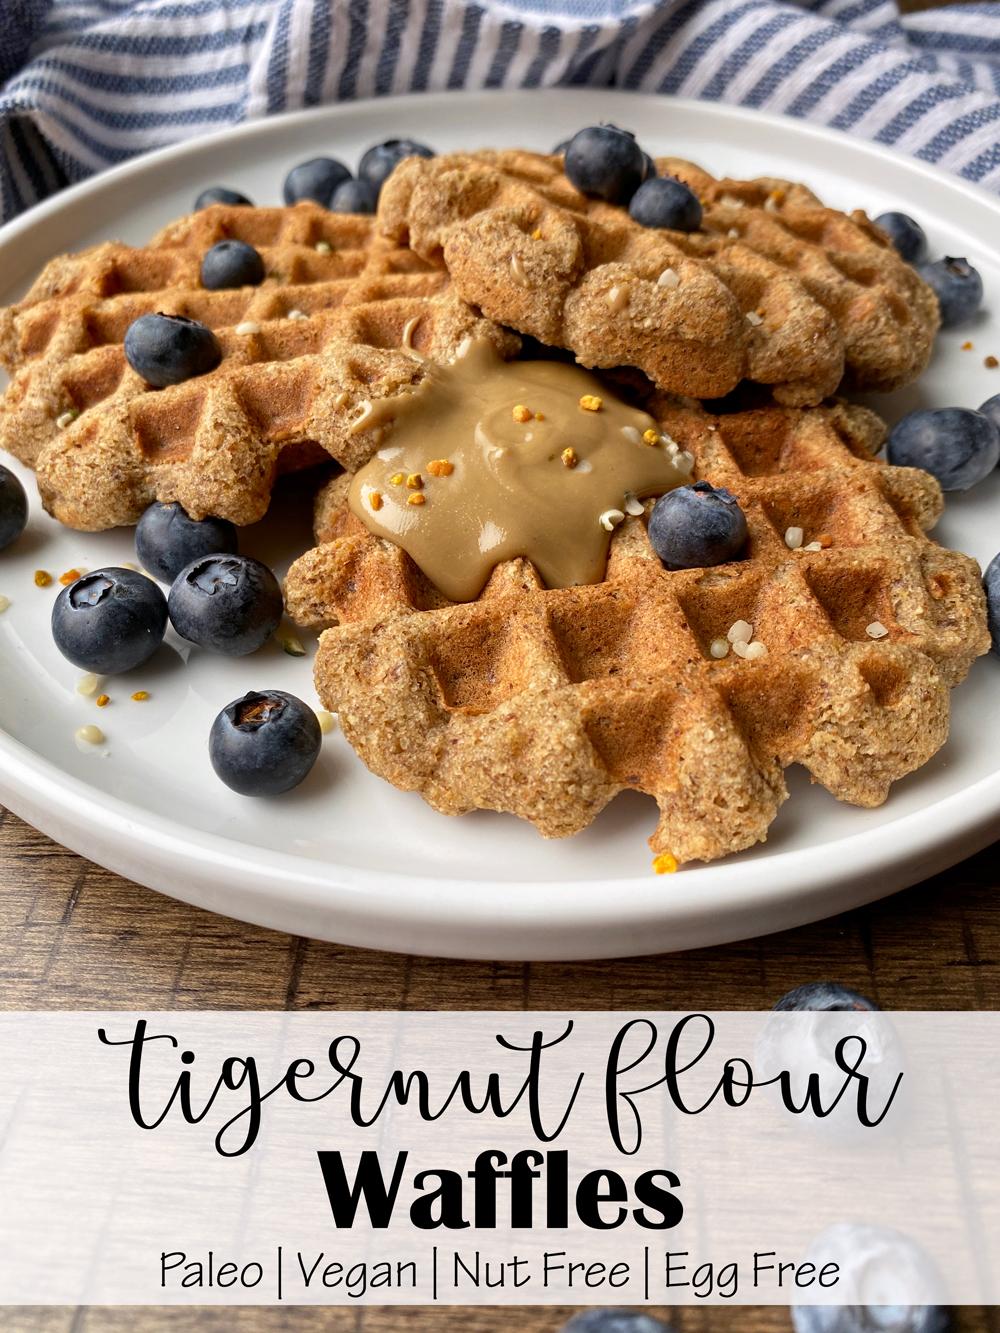 Paleo-Vegan-Tigernut-Flour-Waffle-Recipe